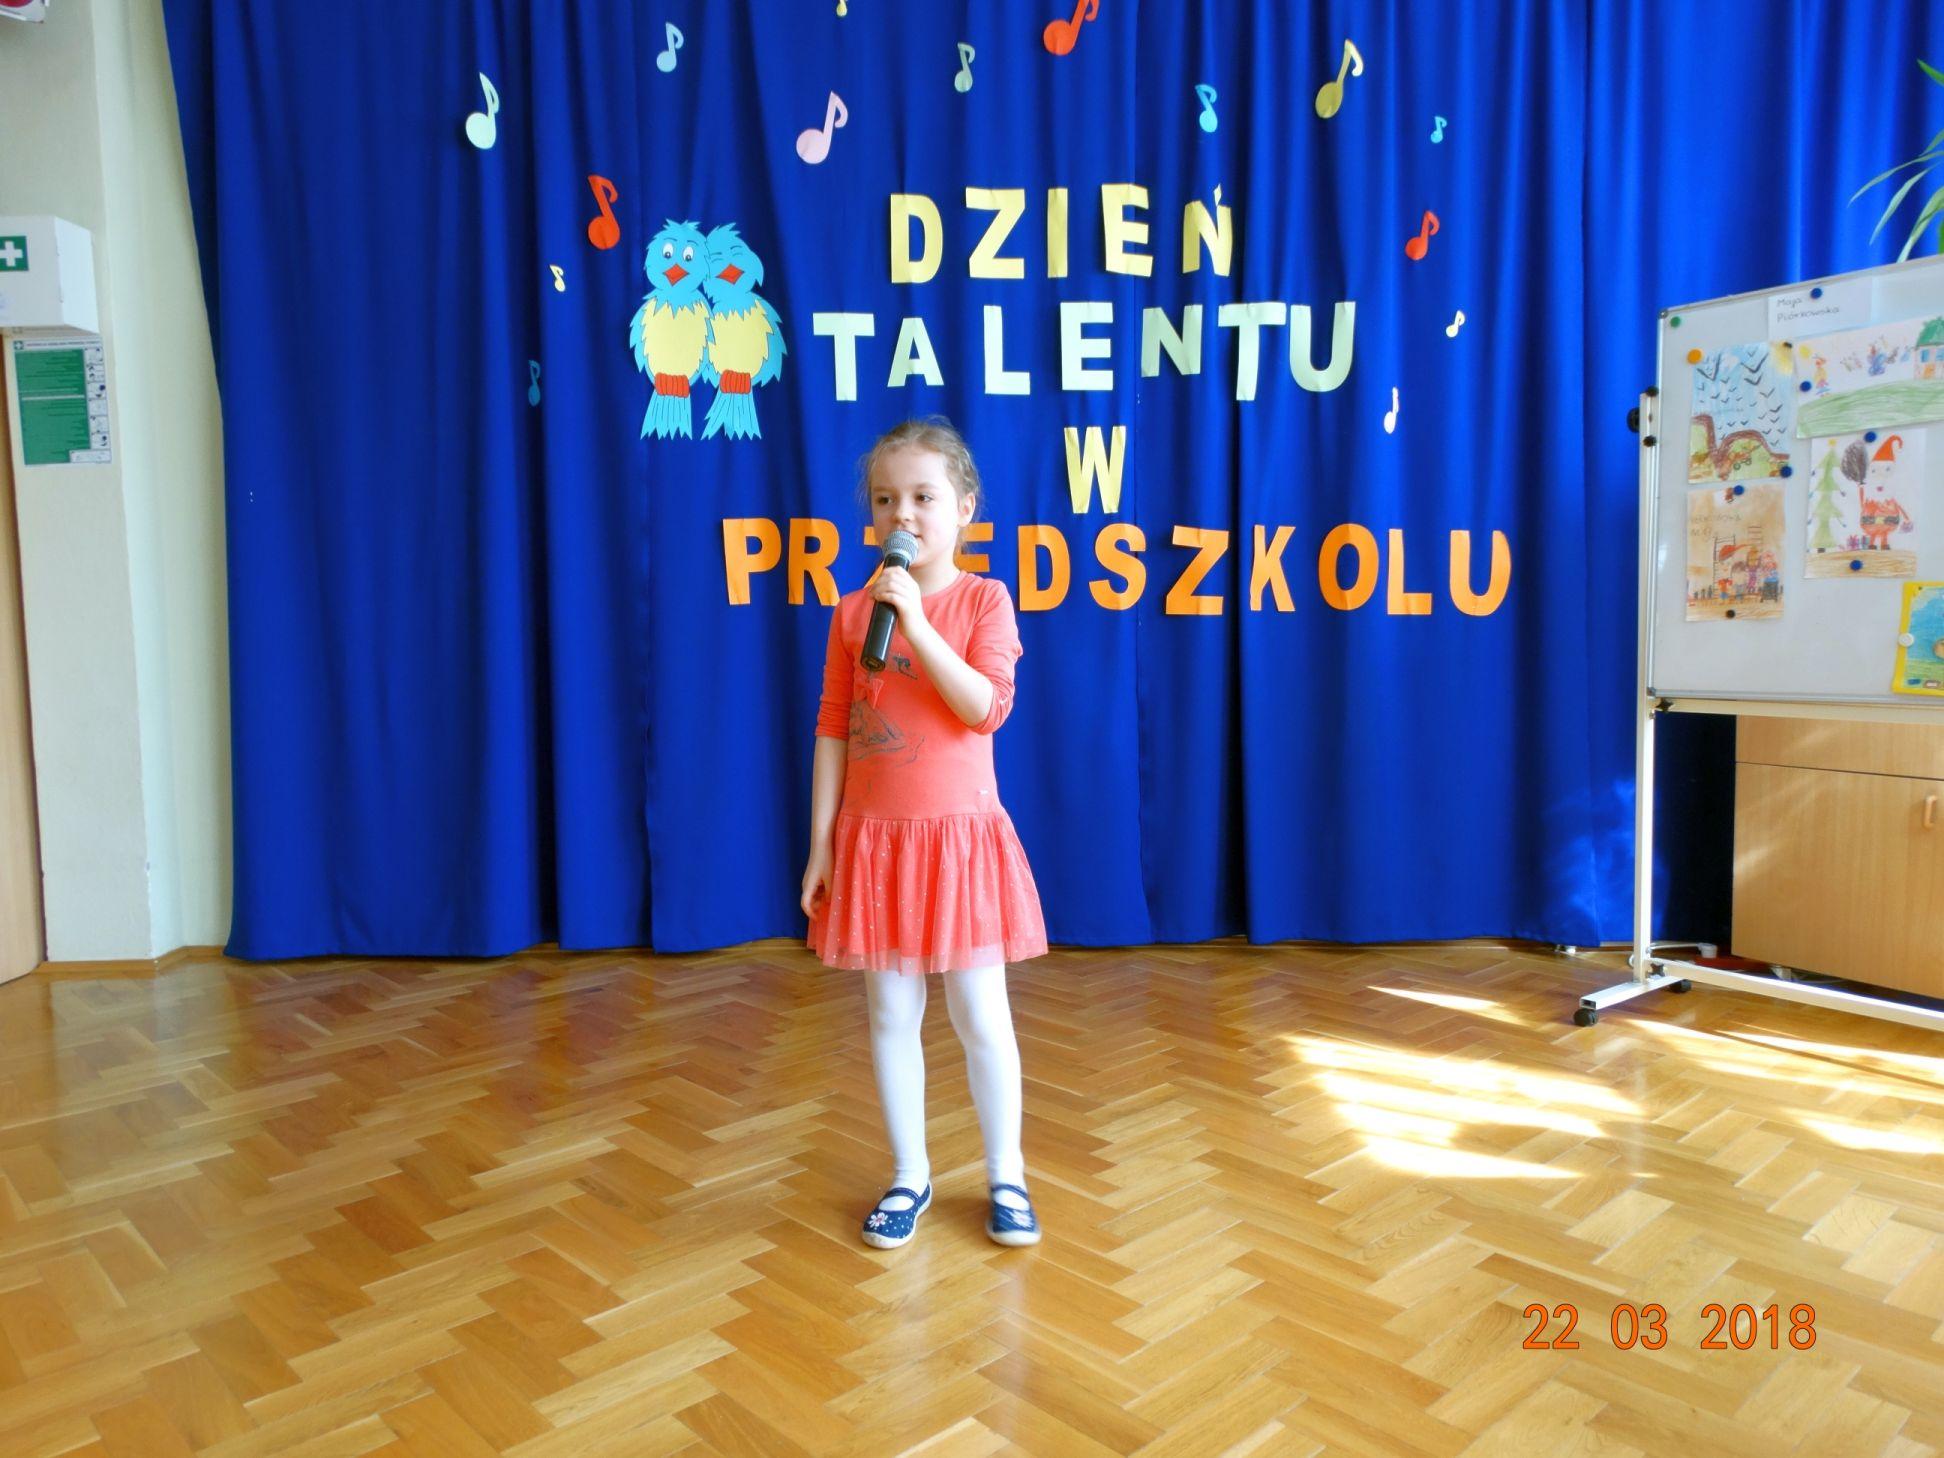 Dzien talentow 2018 (13)